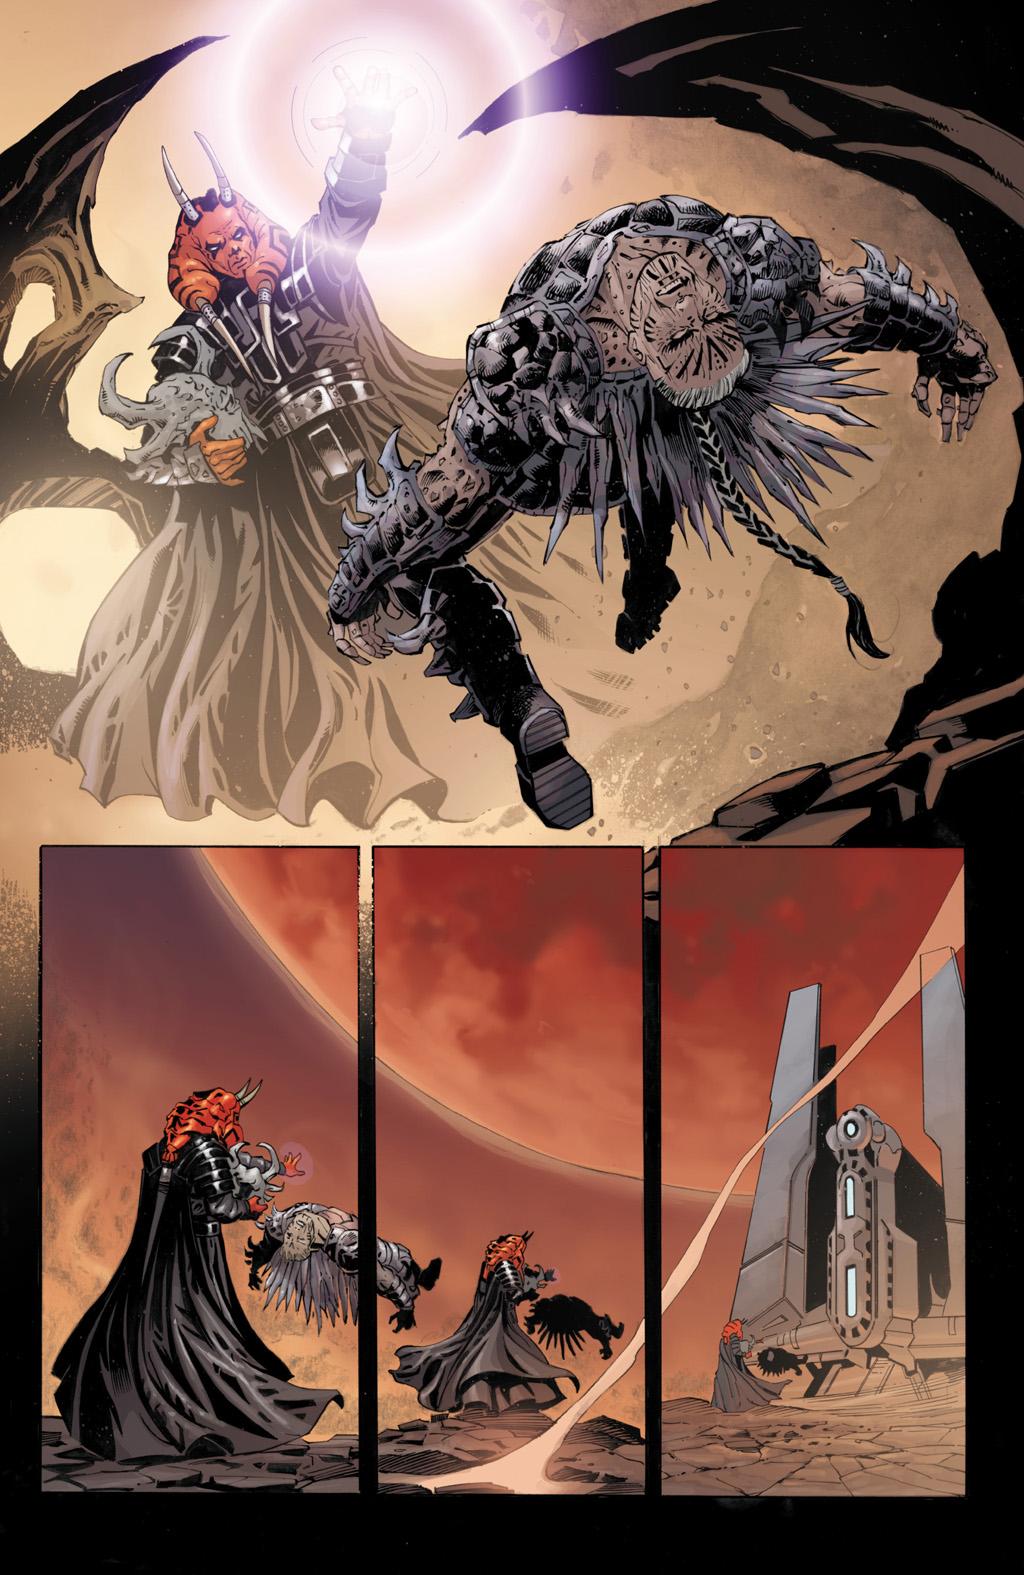 Darth Wyyrlock III Betrays Darth Krayt